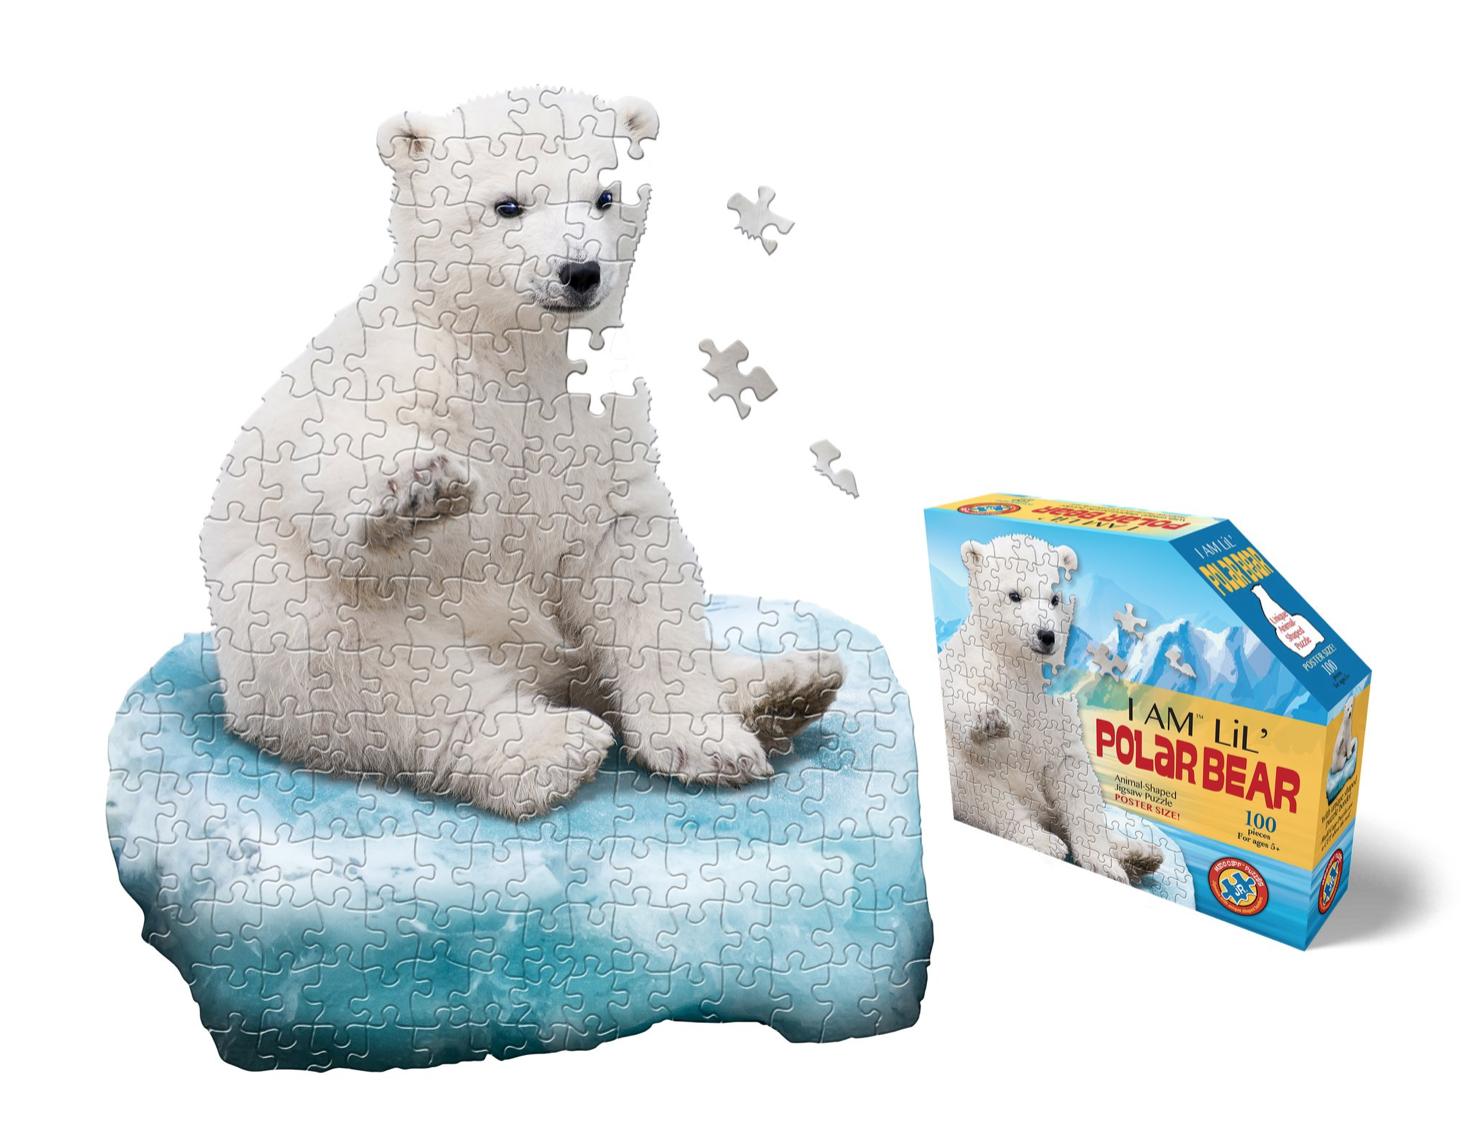 E11even I Am Lil Polar Bear